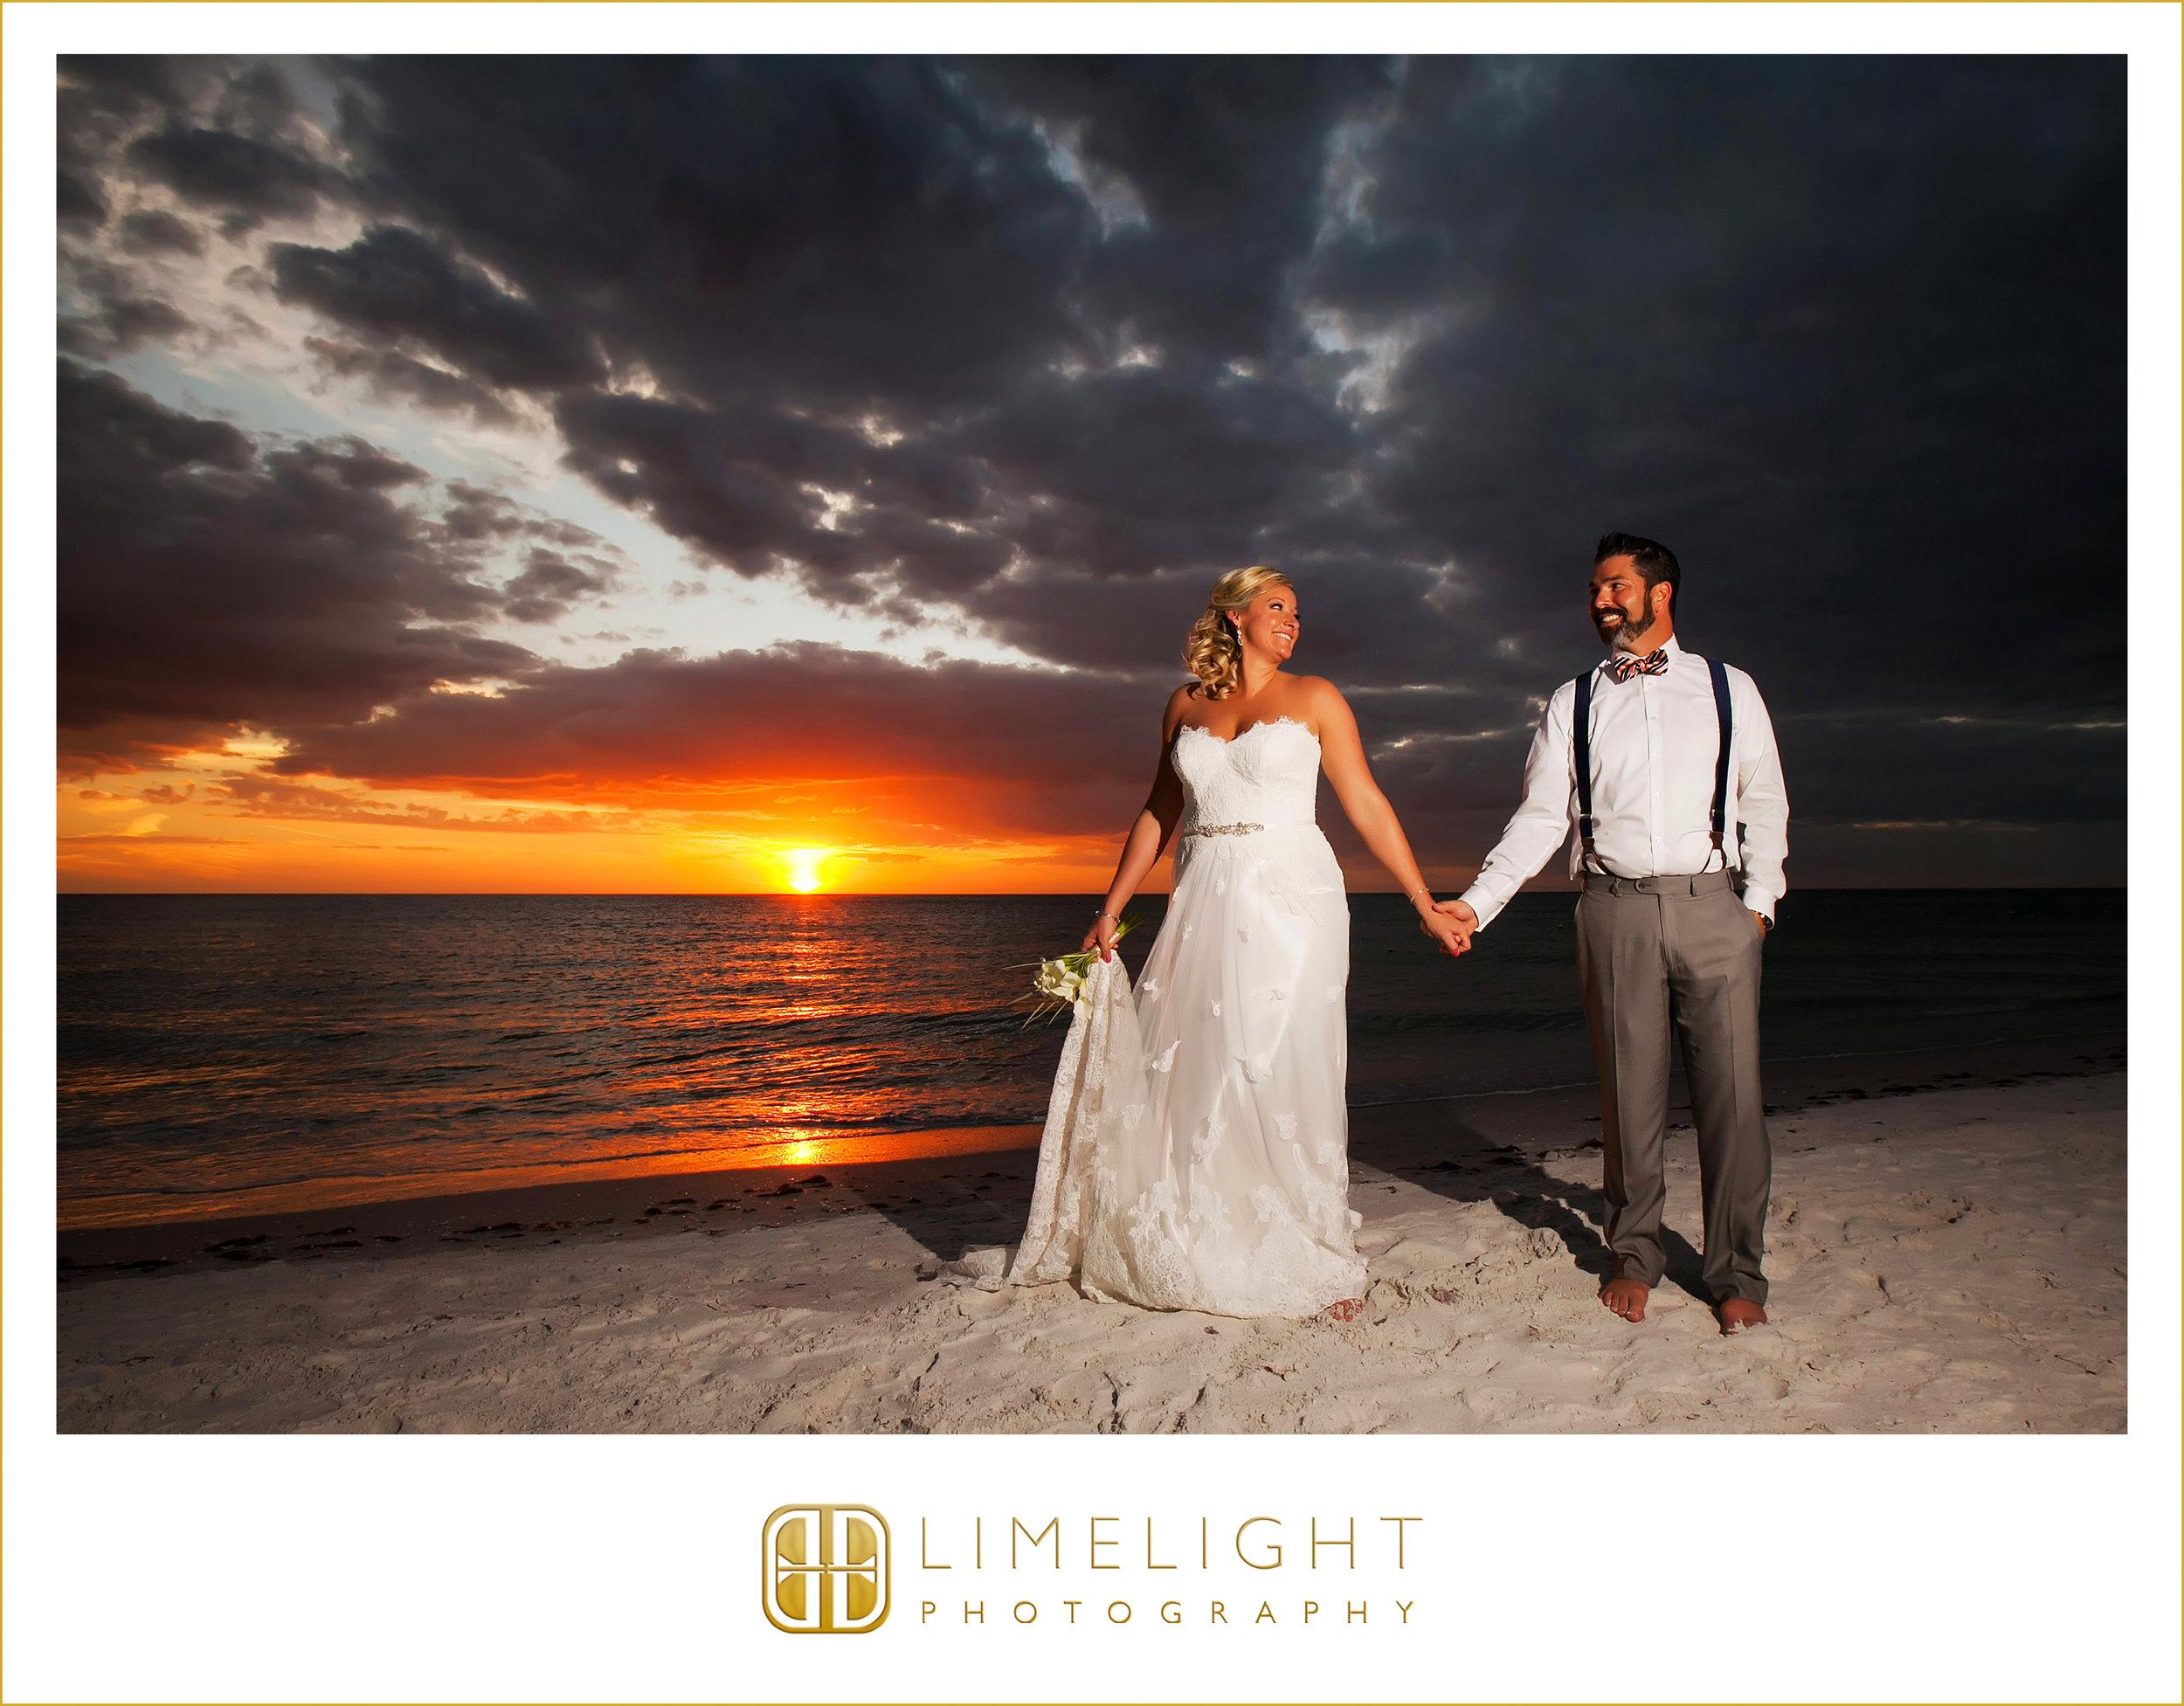 Sunset | Mr. & Mrs. | Wedding